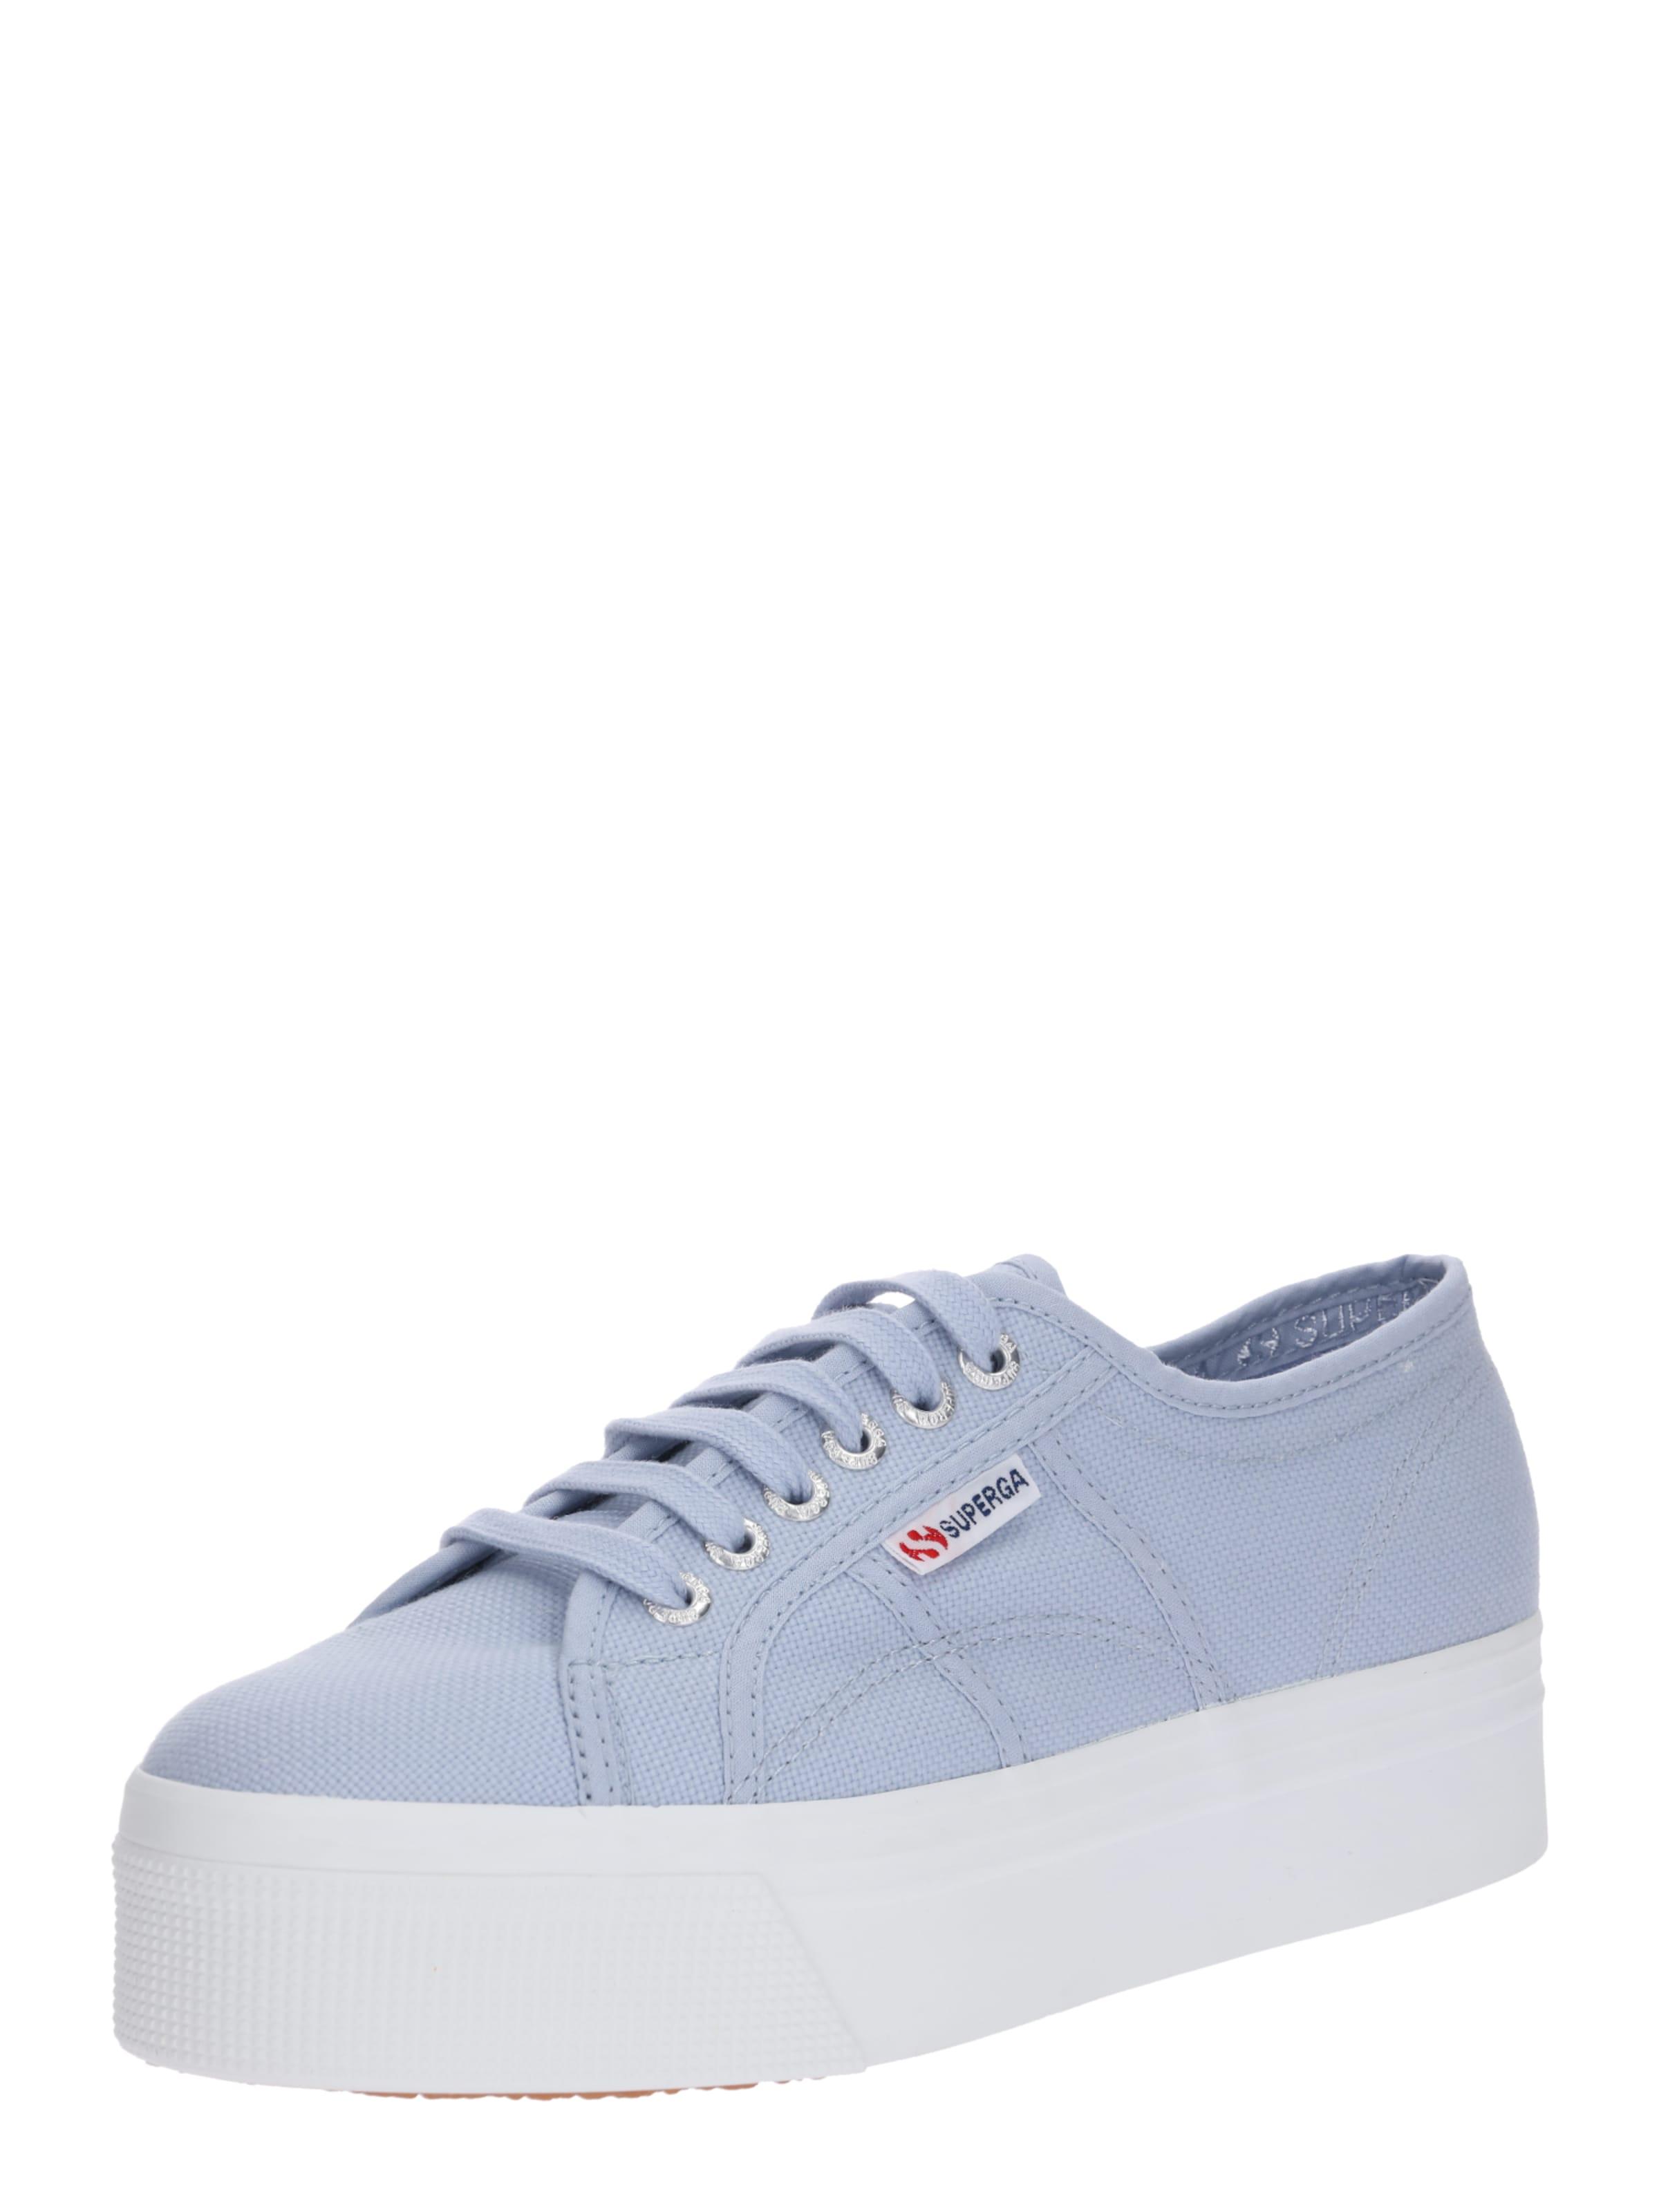 Sneaker Superga Down' Linea '2790 In NavyWeiß Upamp; Acotw Yb7ygf6